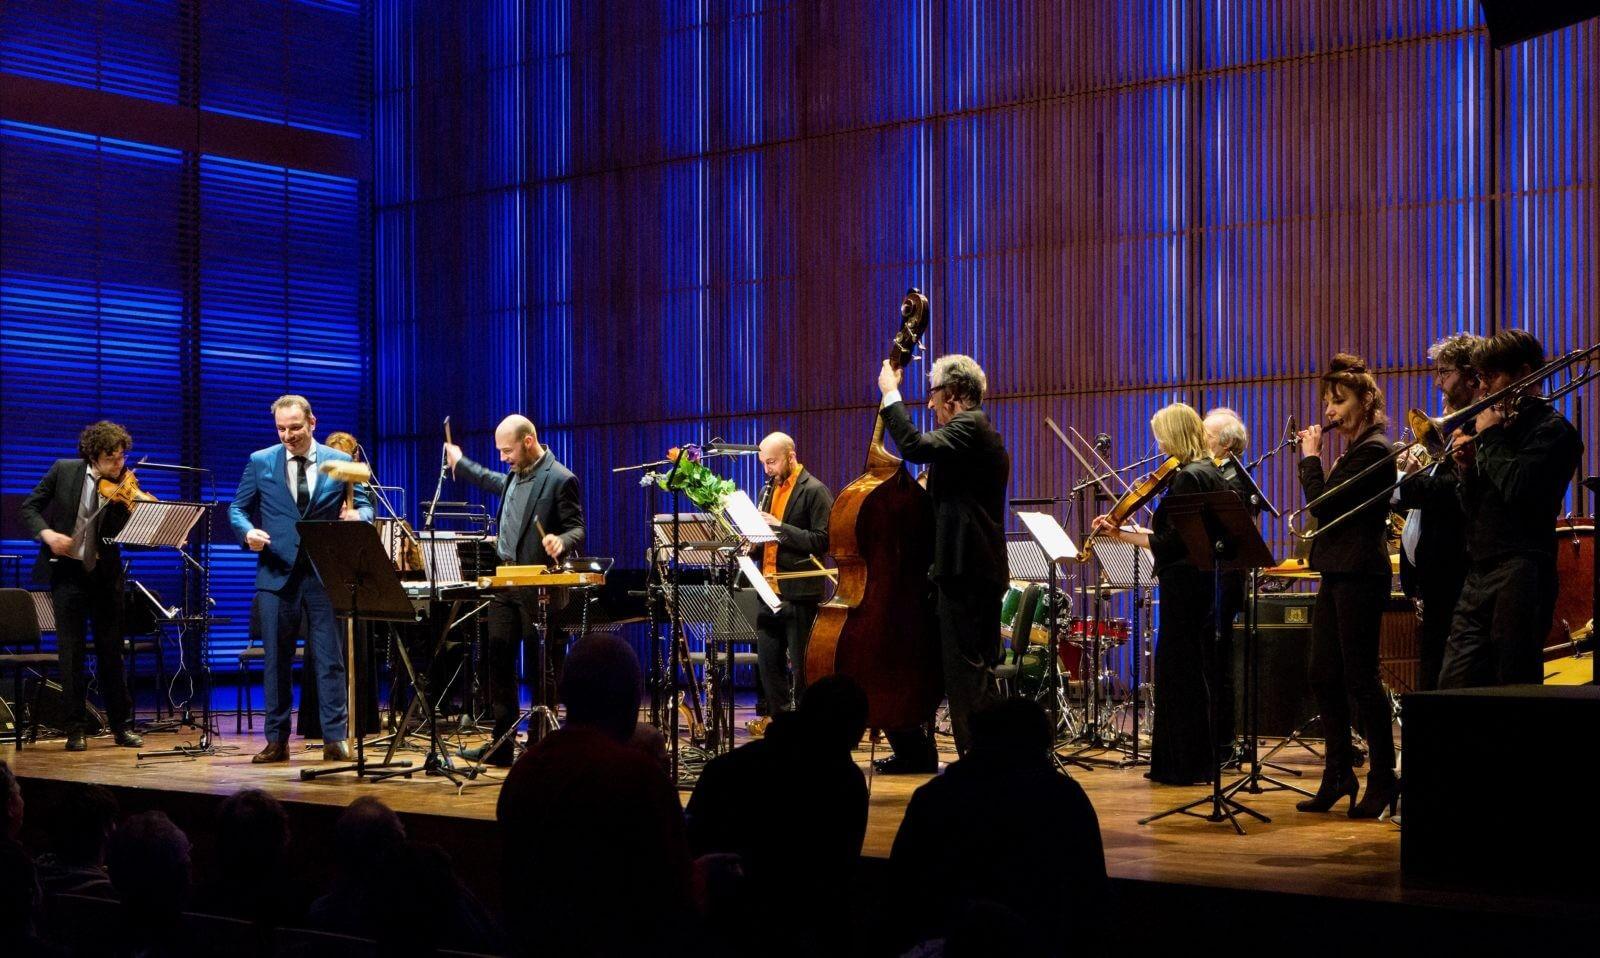 Asko|Schönberg - Gaudeamus Muziekweek 2020